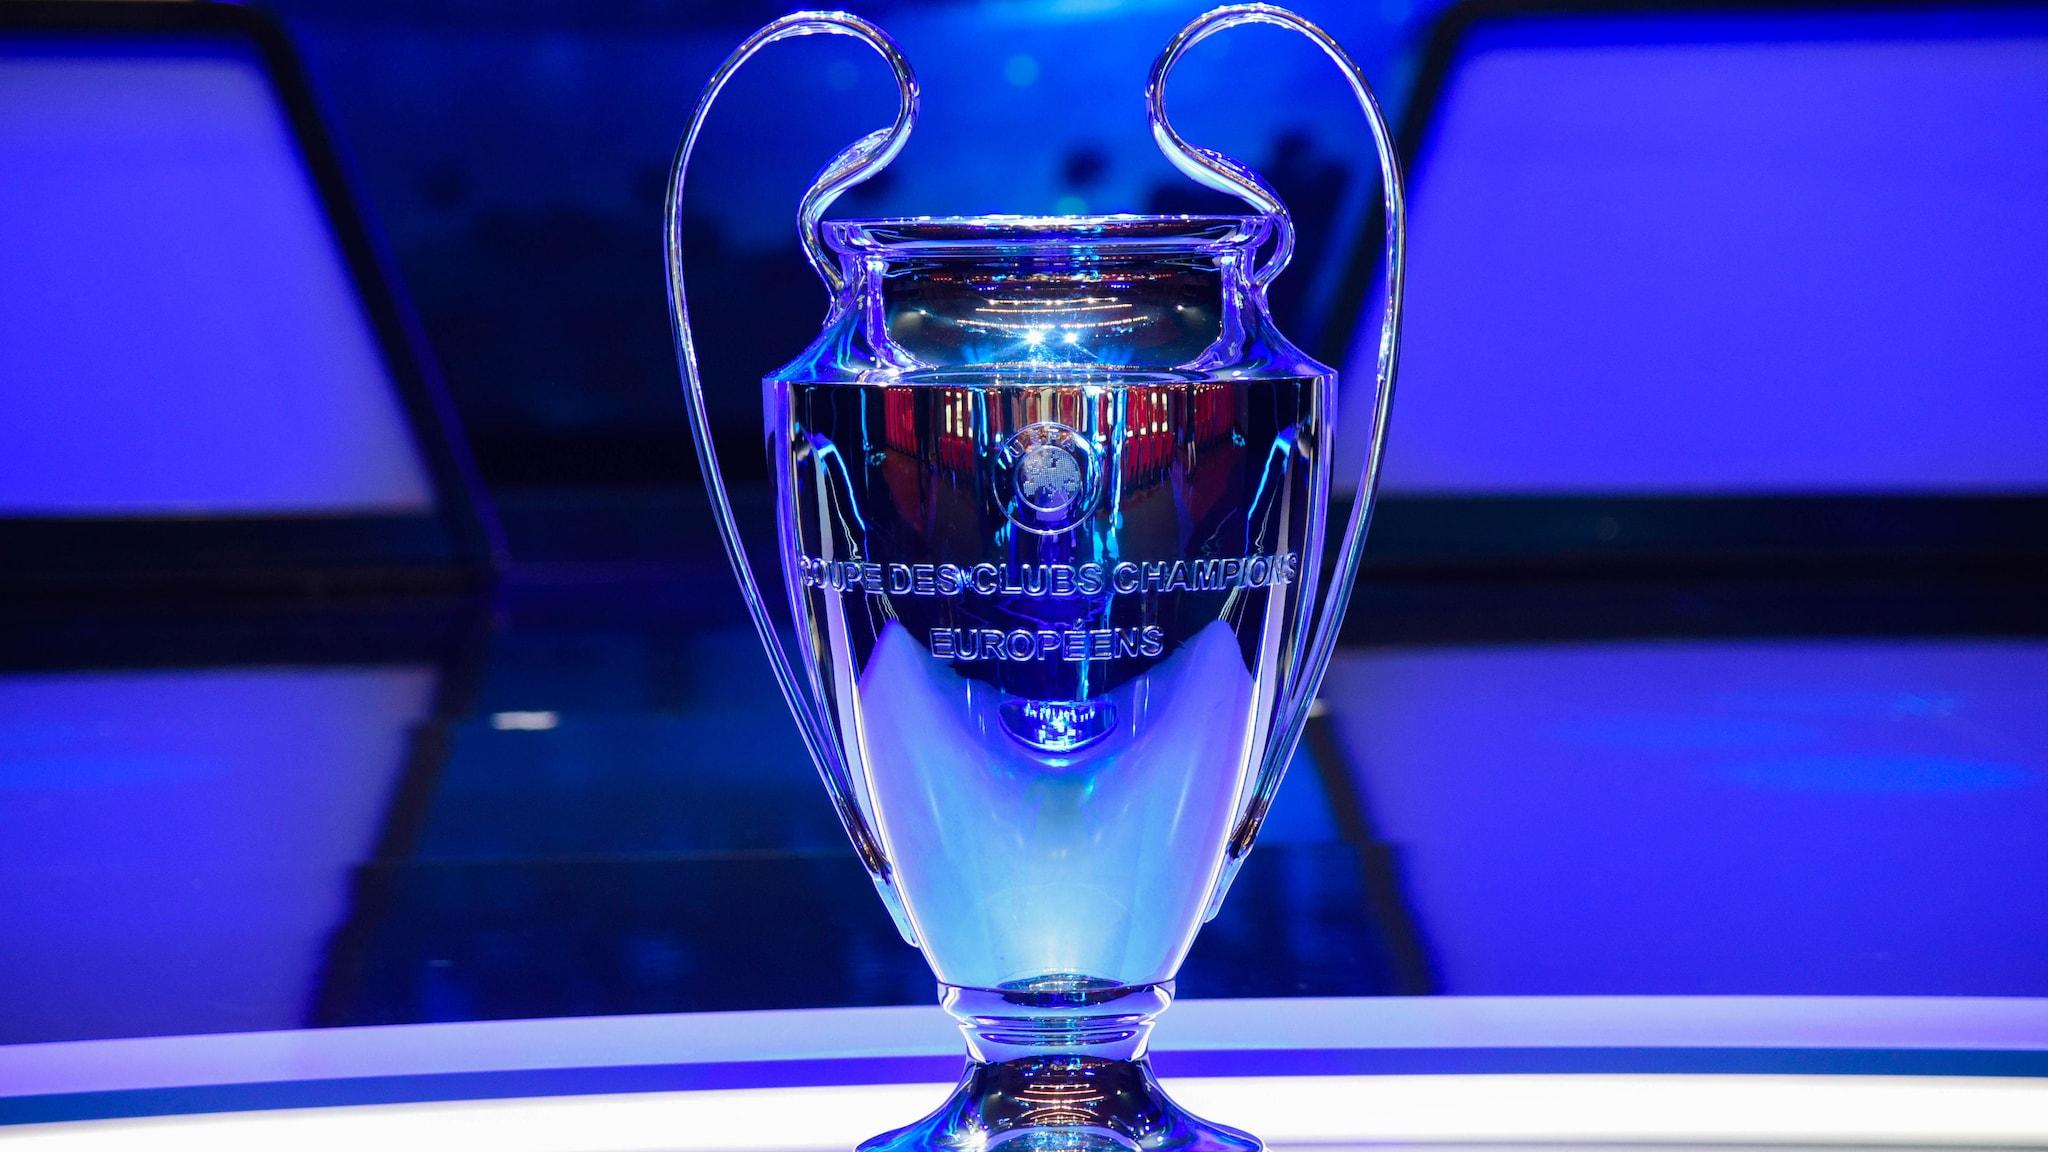 uefa_champions_league_draw_-_2019_2020.jpeg (303.93 Kb)